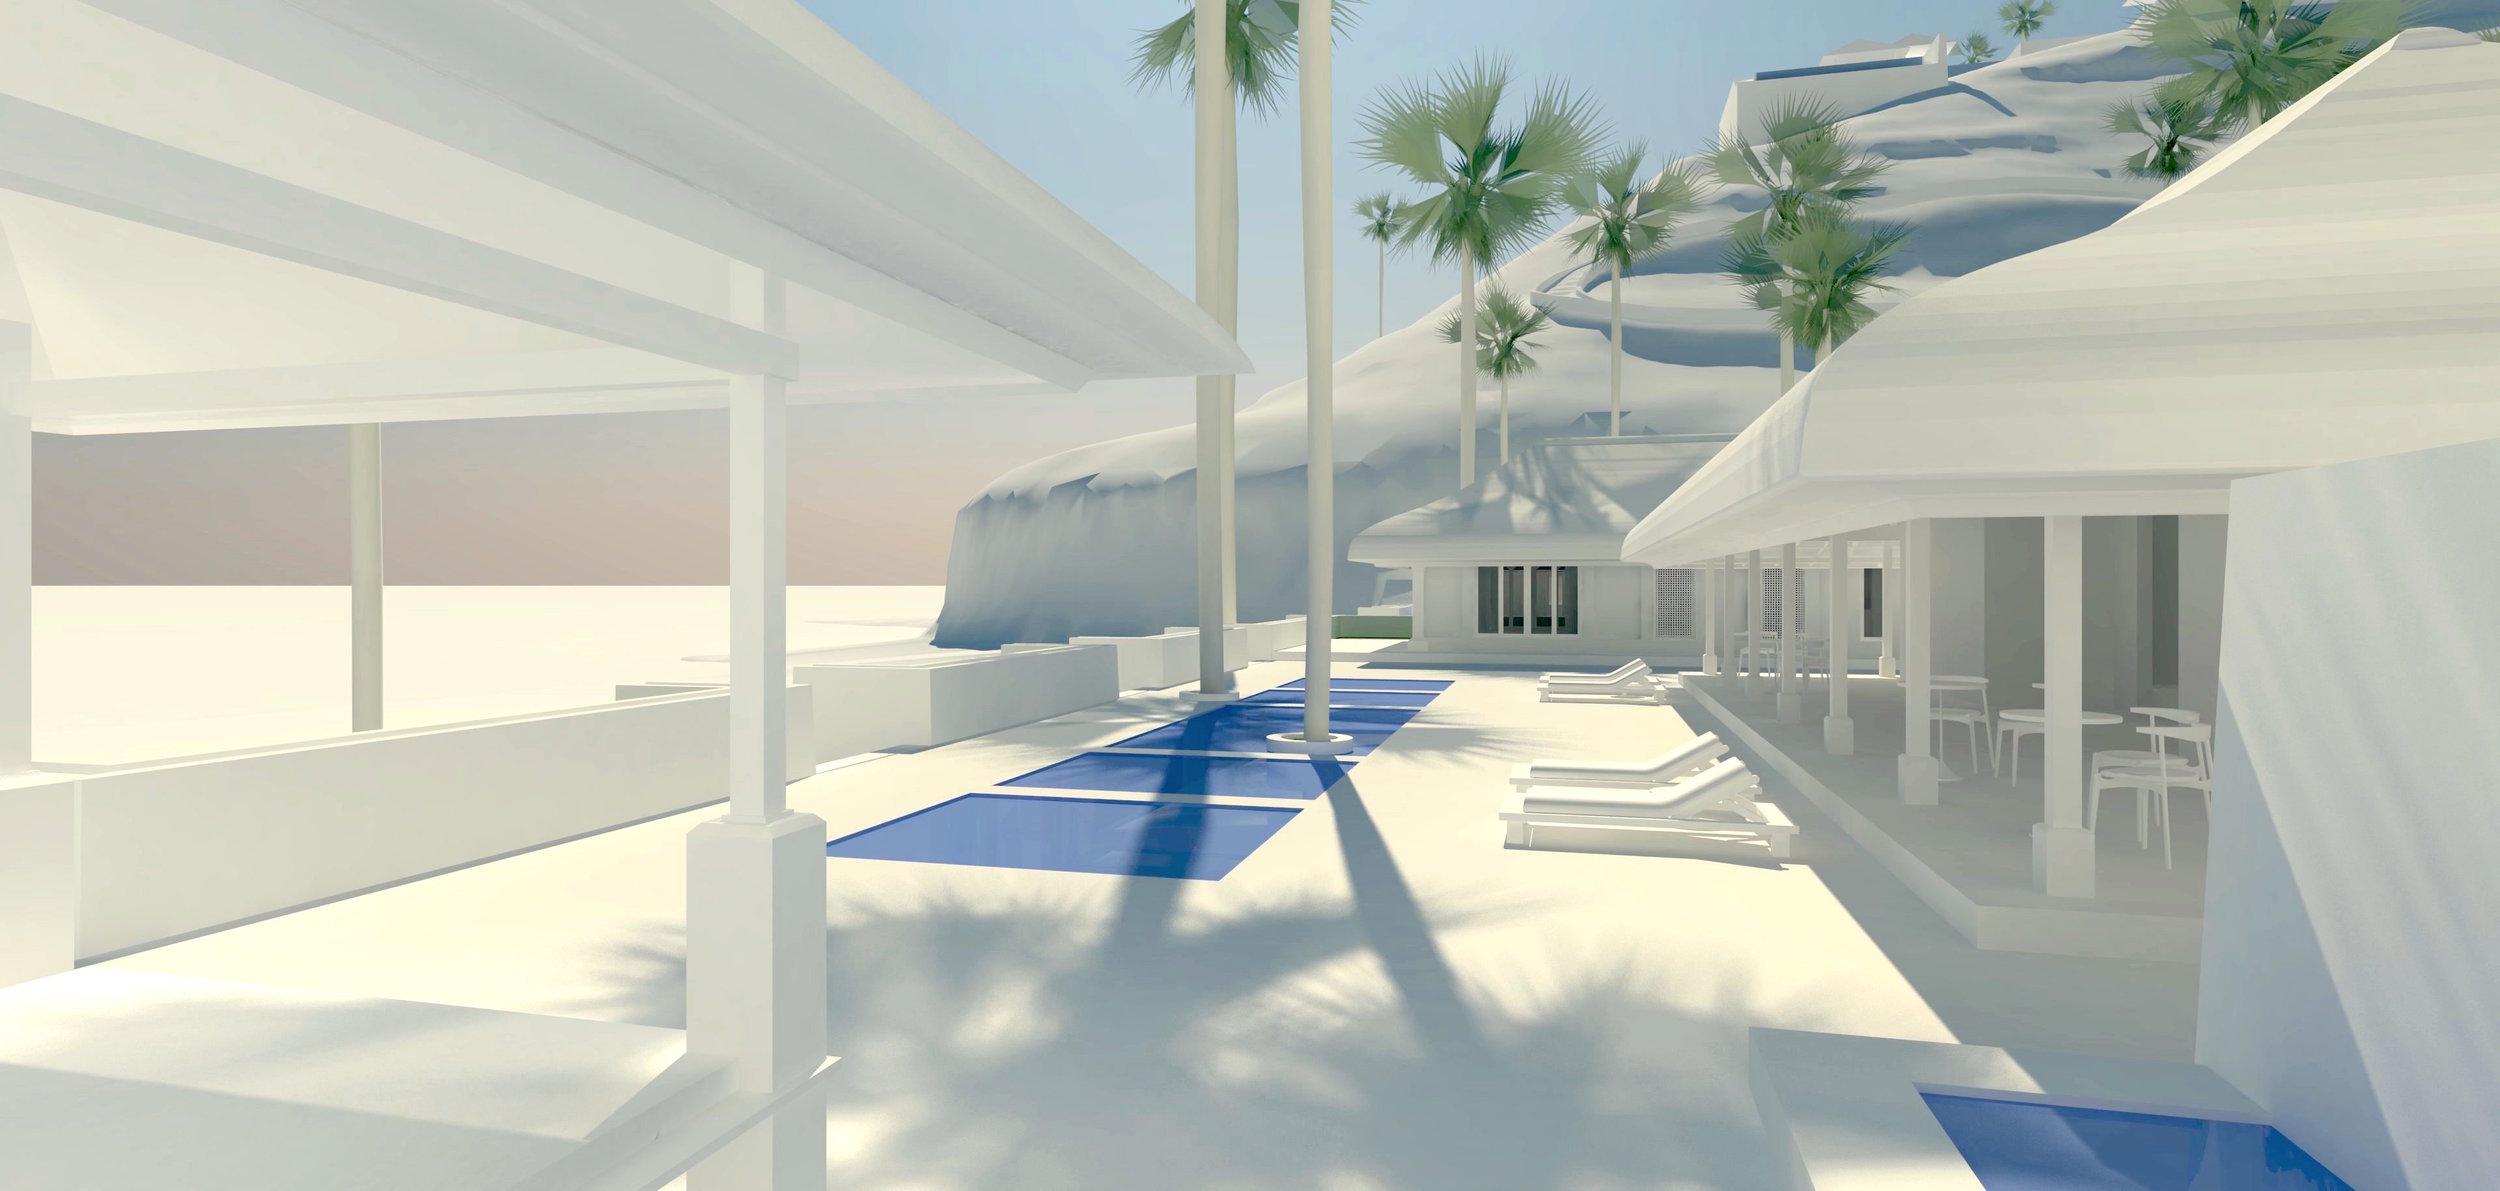 03_Lower Spa_From pool beach building.jpg